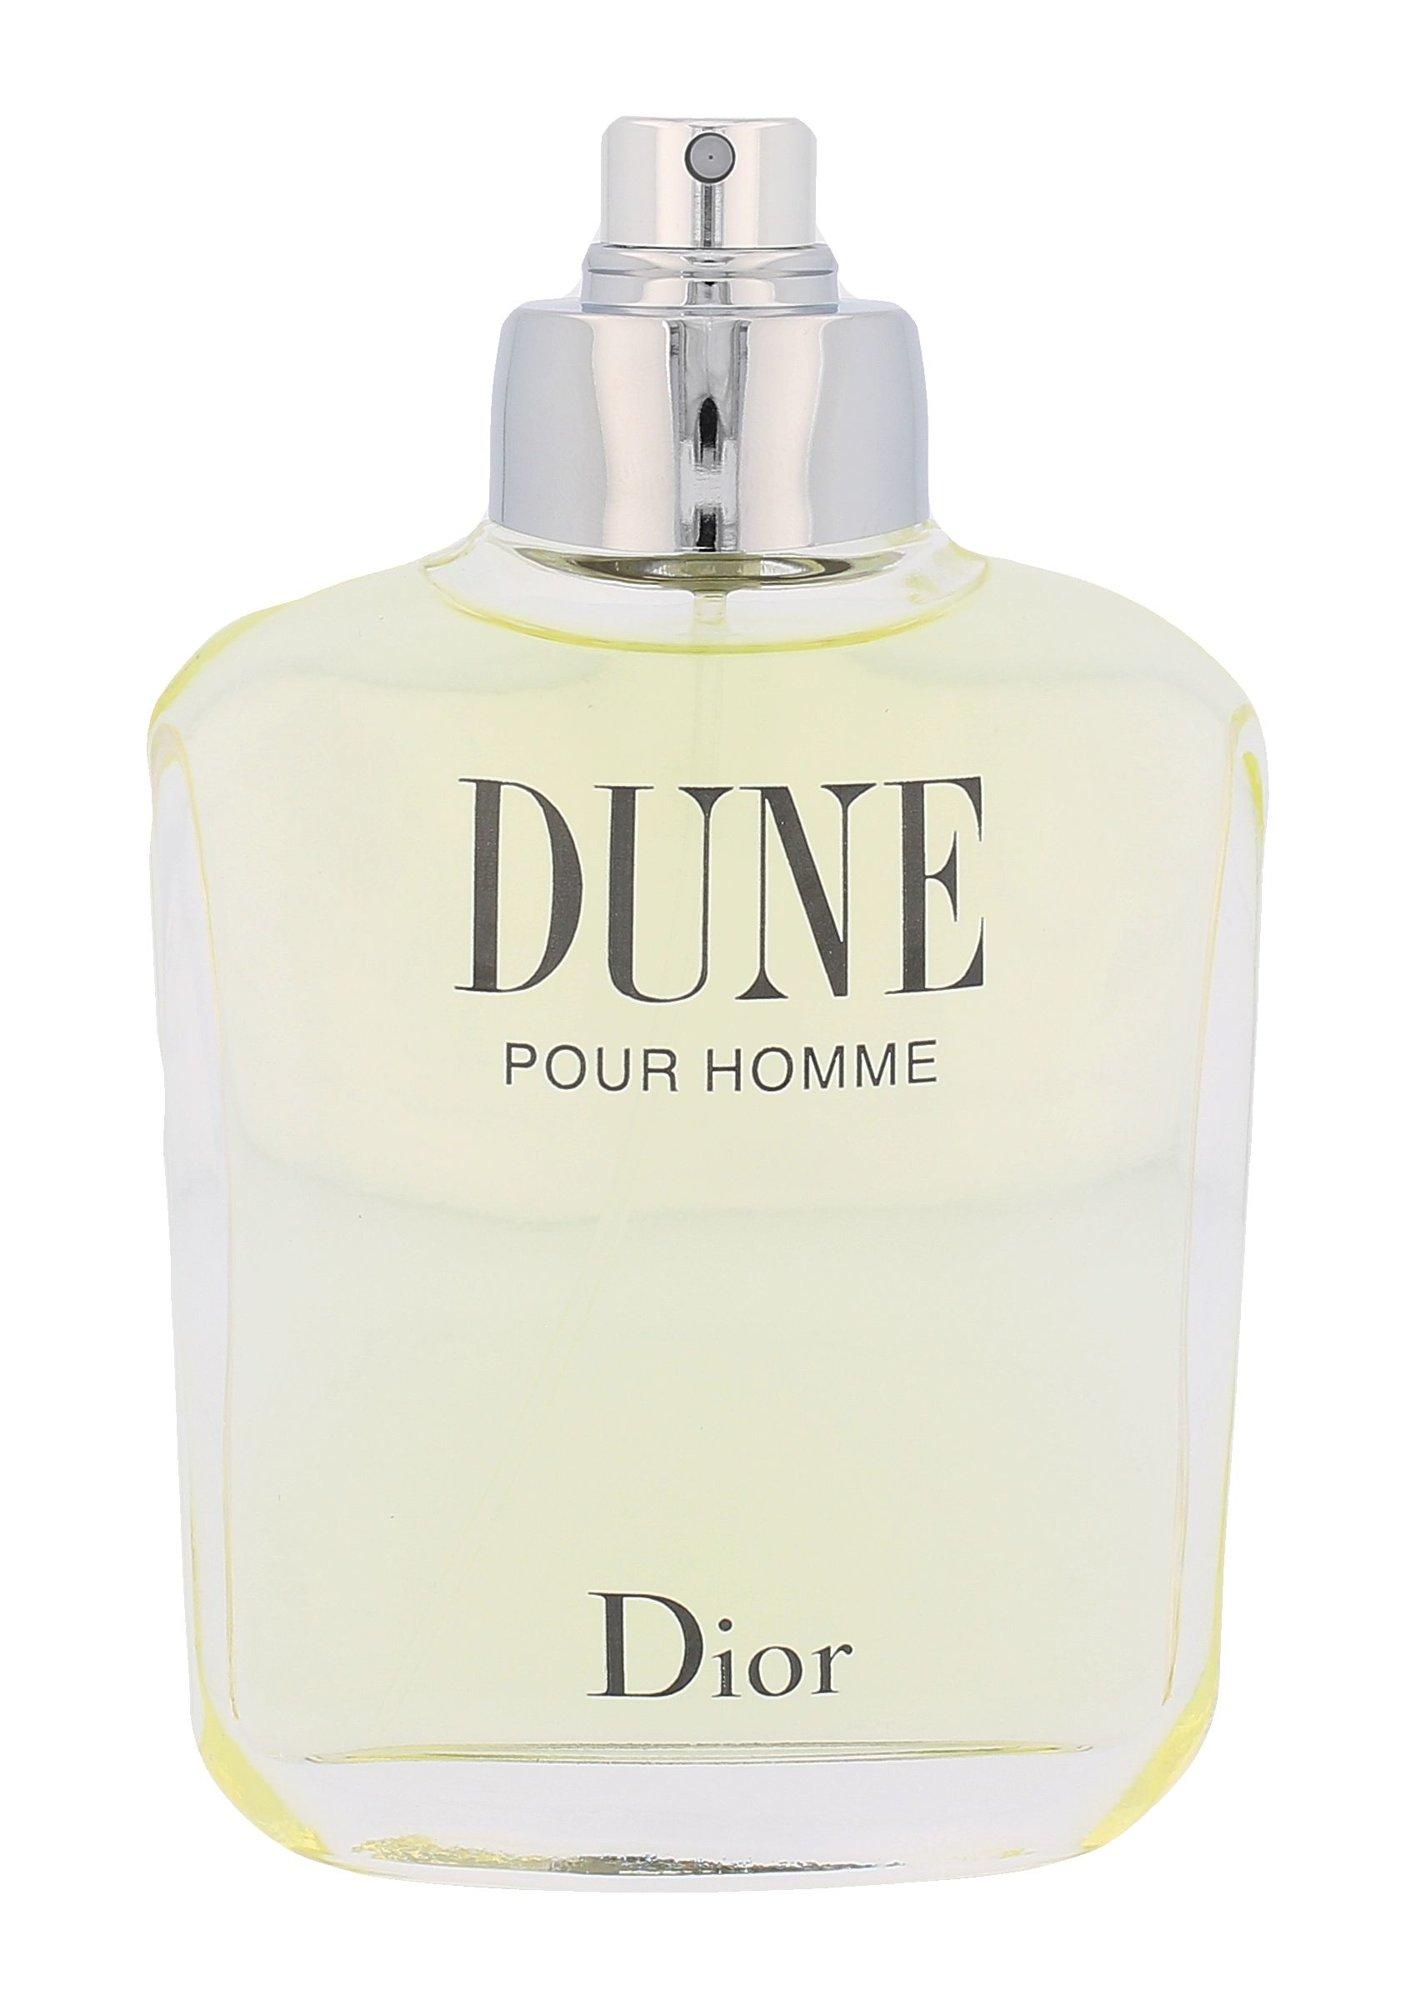 Christian Dior Dune Pour Homme, Toaletná voda 100ml, Tester